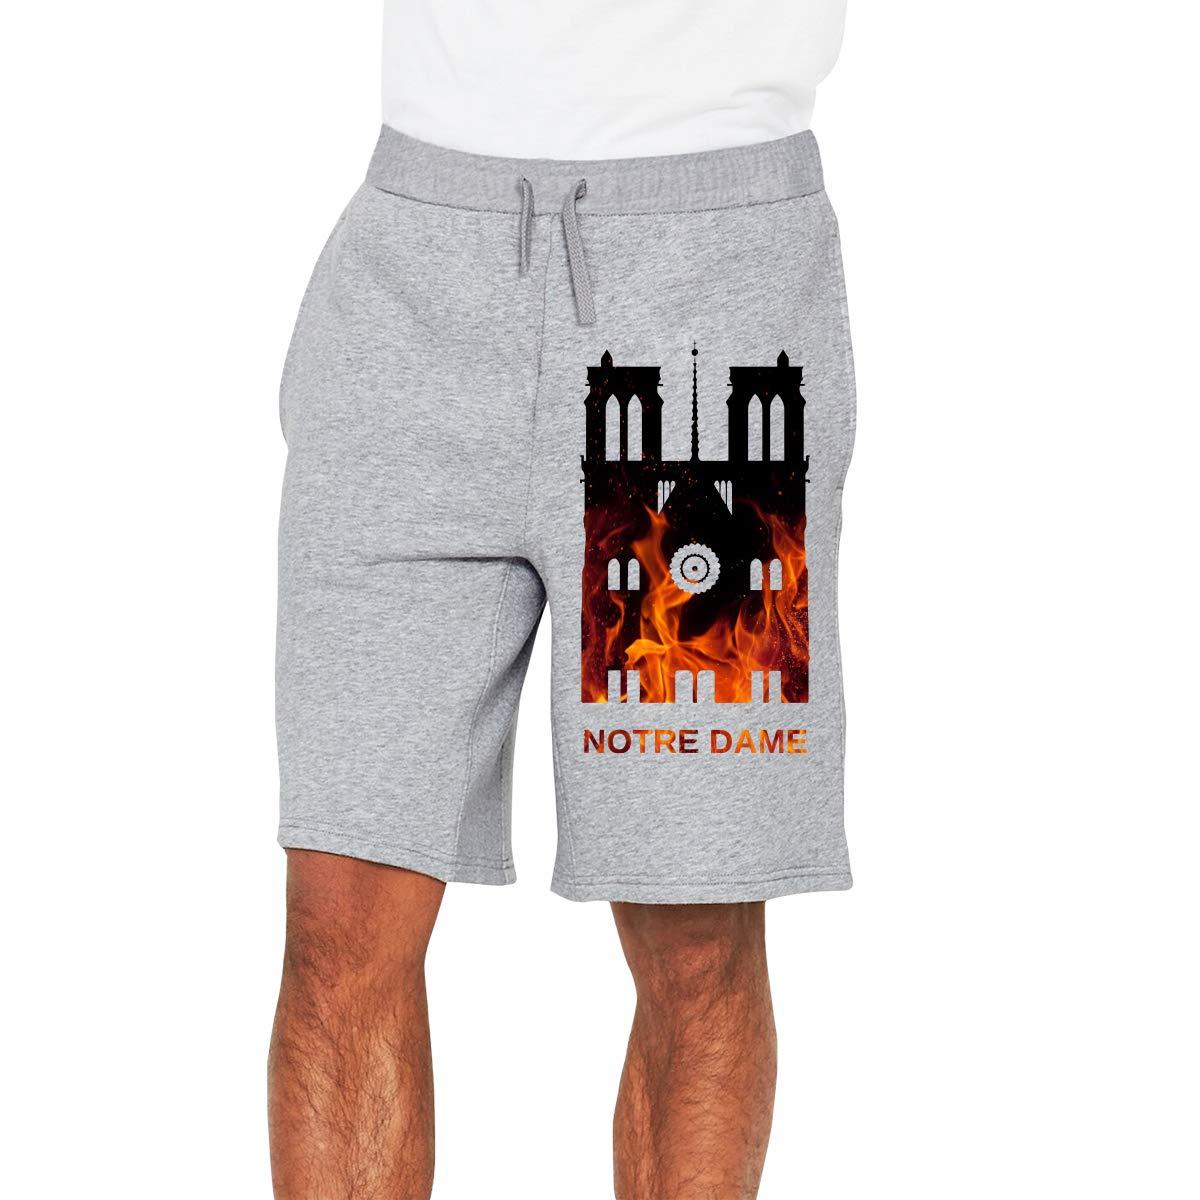 DAM Weight Lifting Gym Short Body Building Jogging Exercise Short S-XL Running